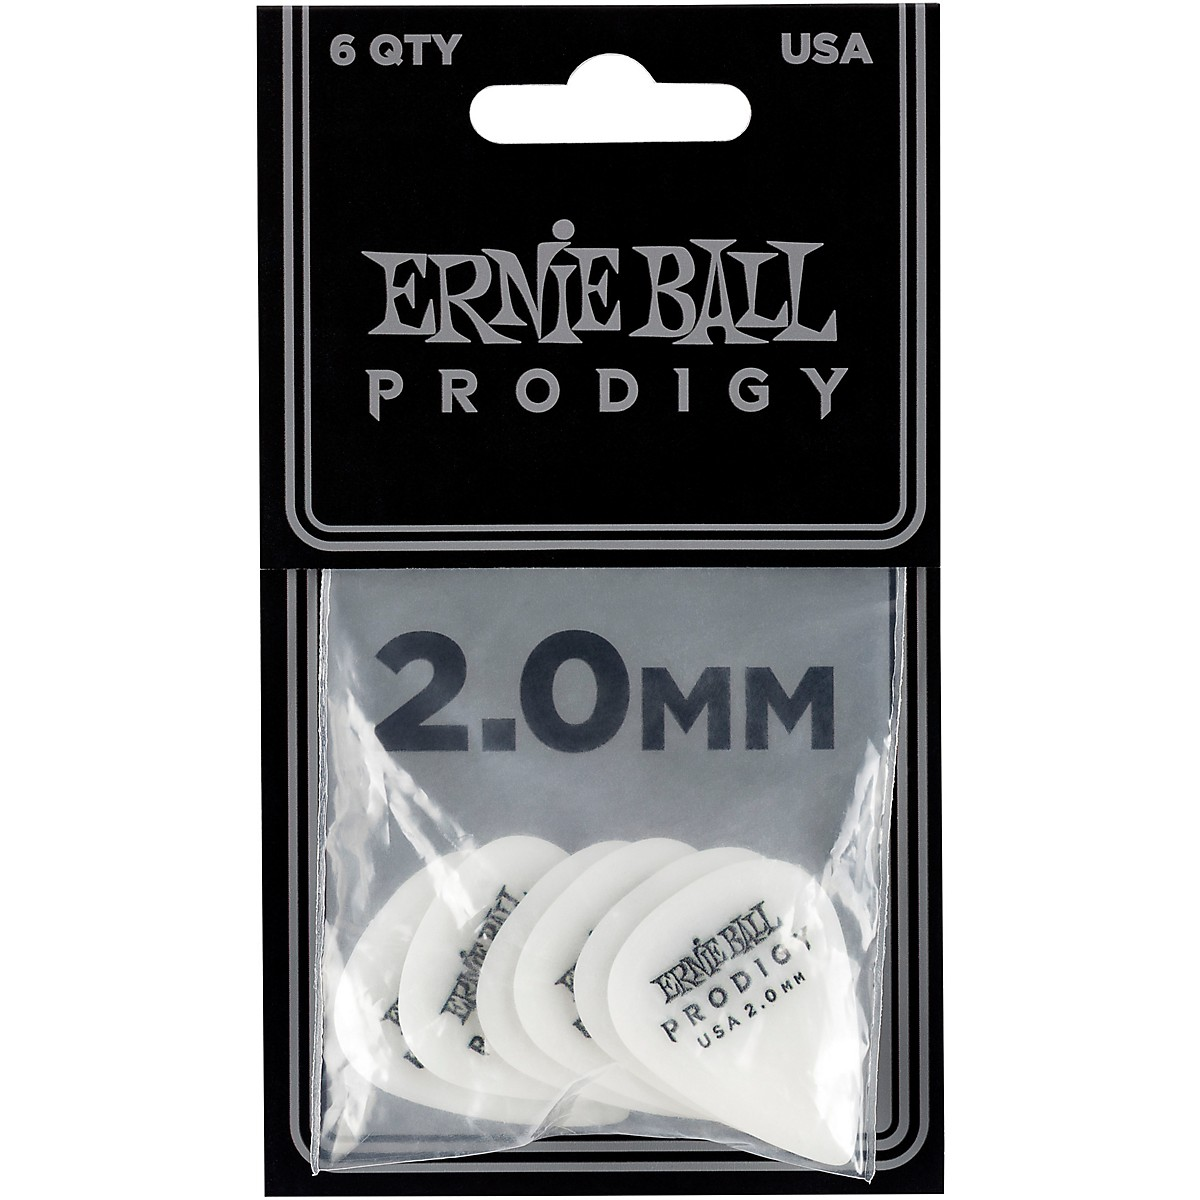 Ernie Ball Prodigy Picks Standard